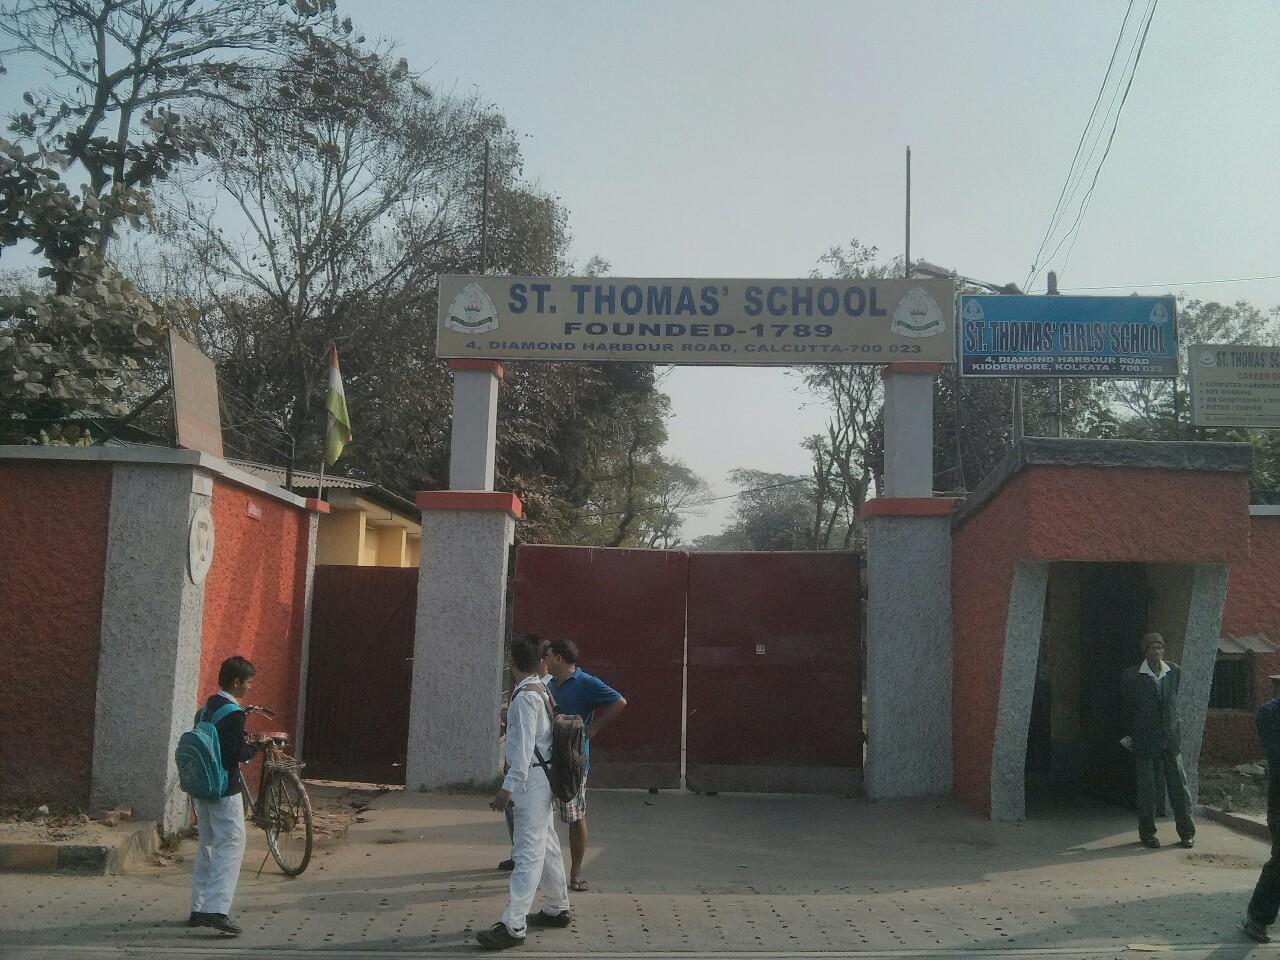 St Thomas' School at Kidderpore in Kolkata (formerly Calcutta)